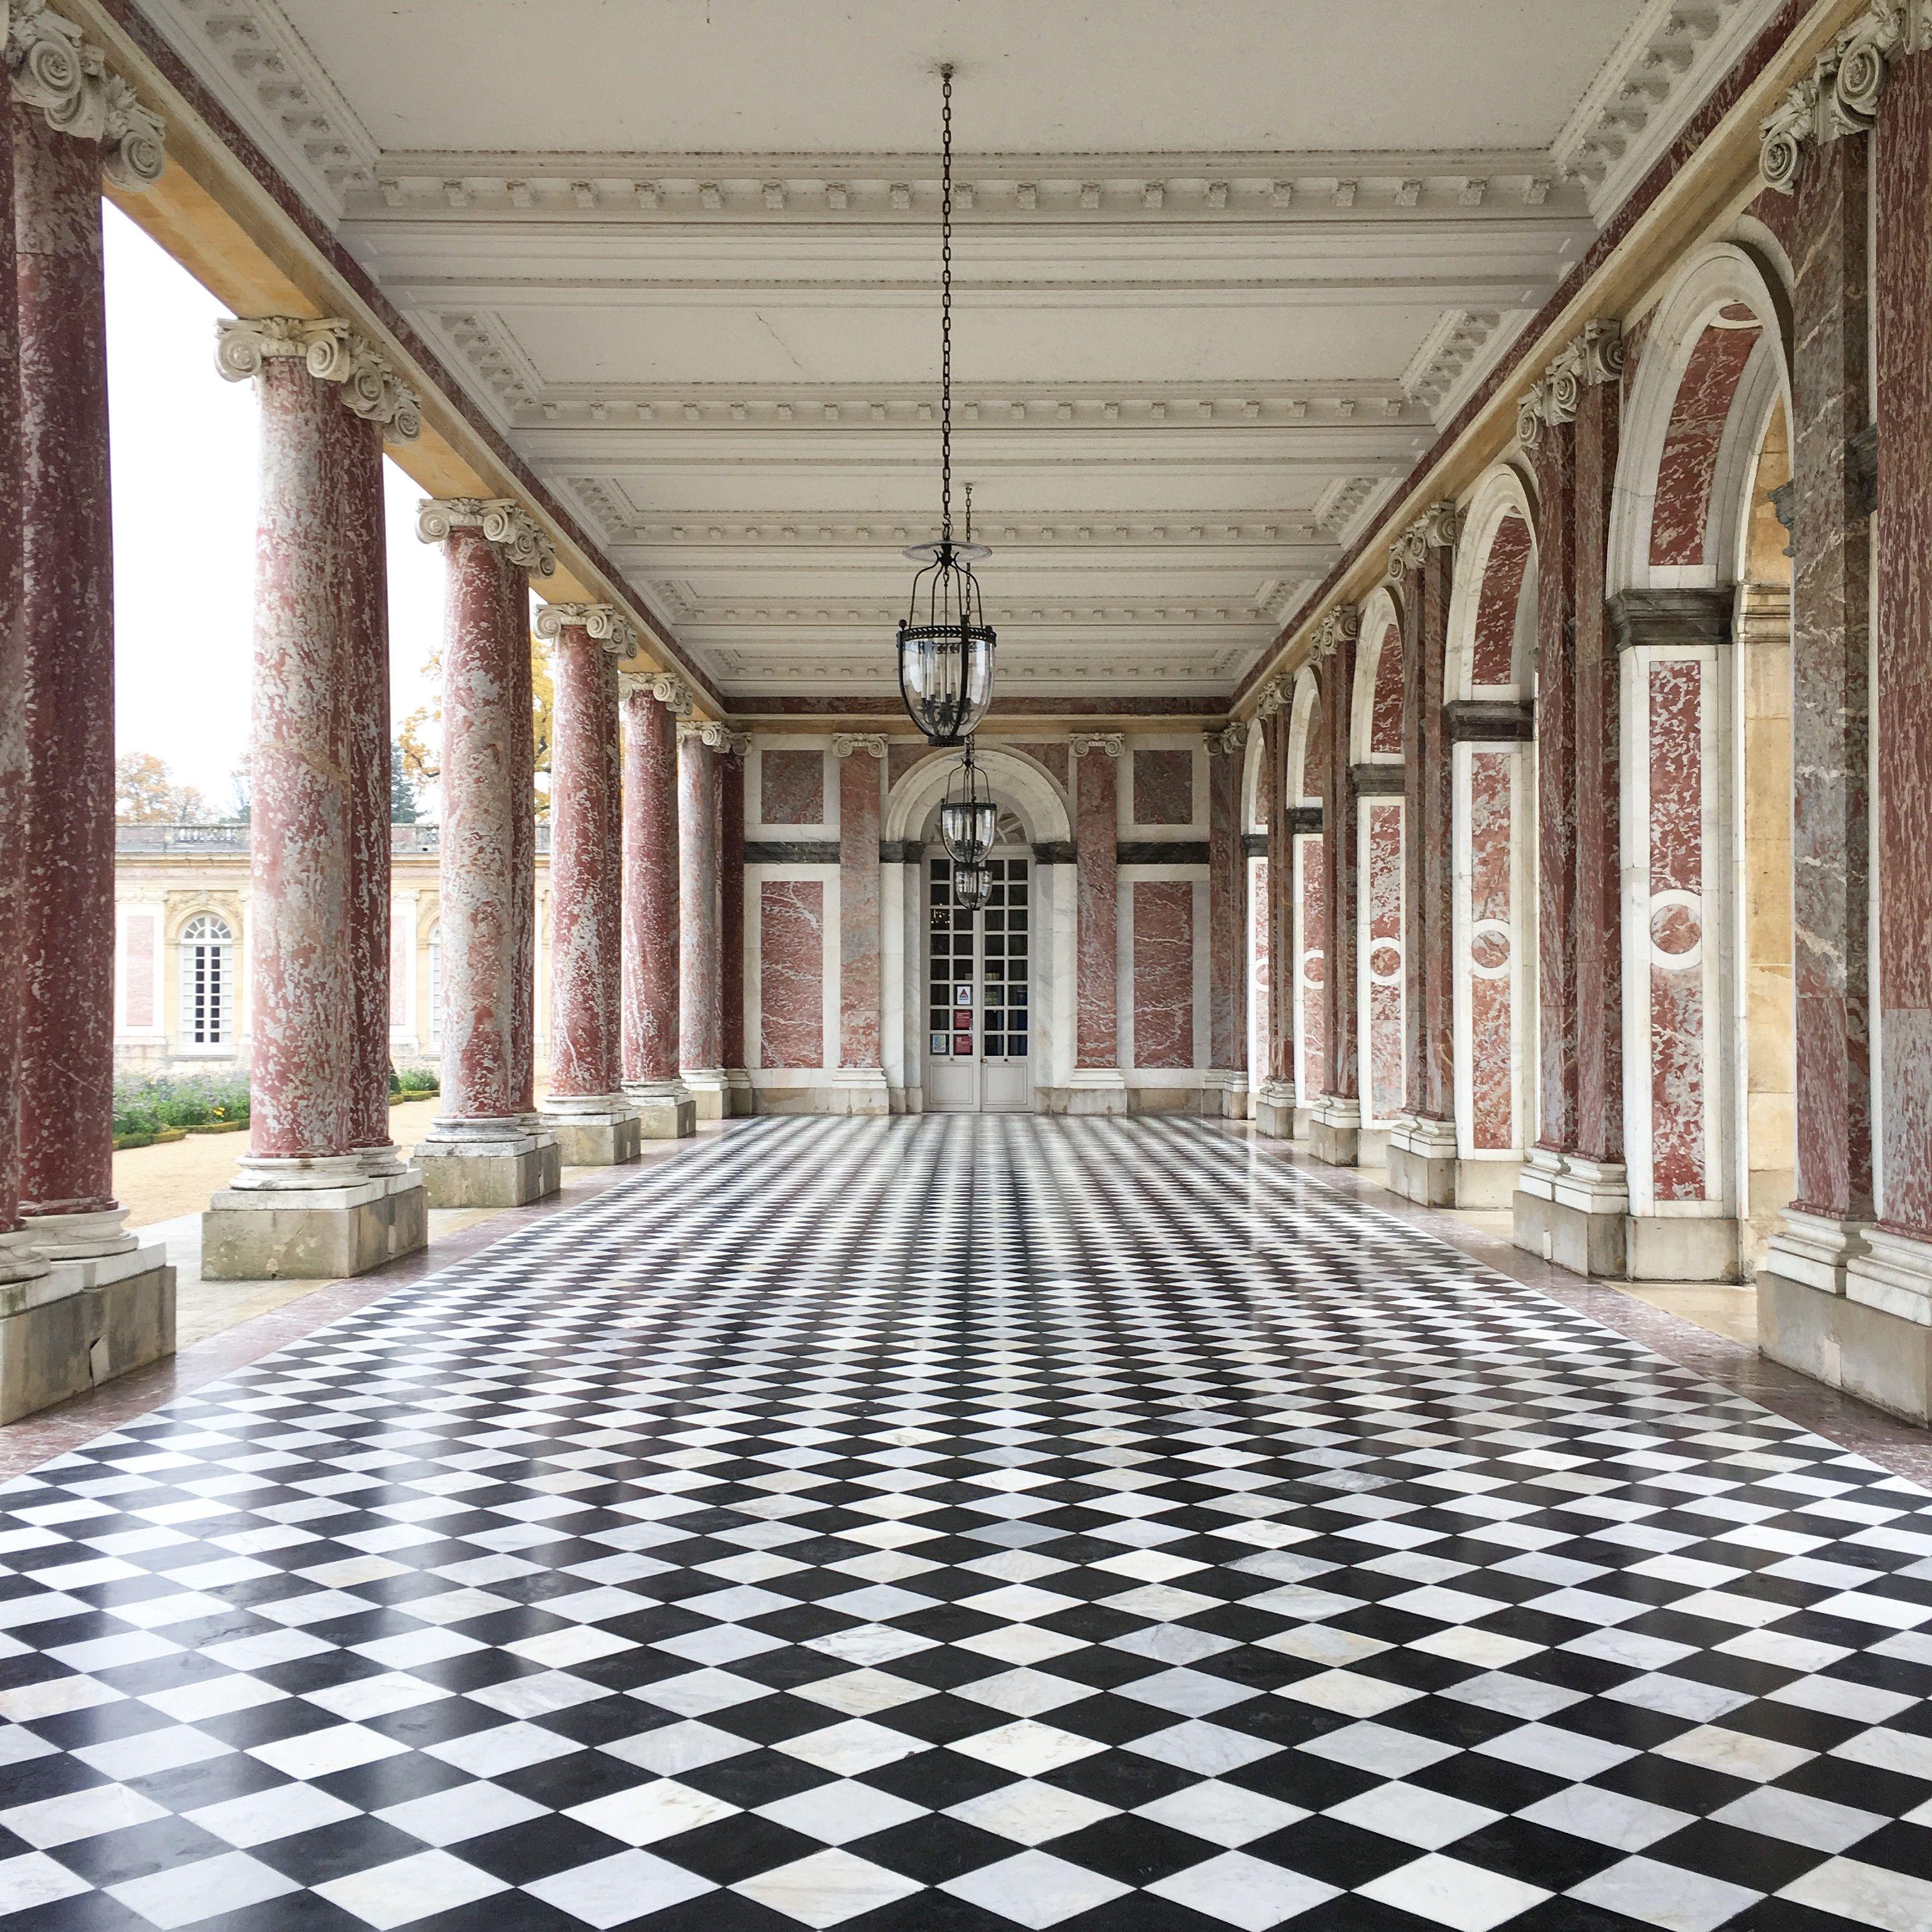 Paris Apartments Versailles: Marble Peristyle In Grand Trianon- Versailles Photo